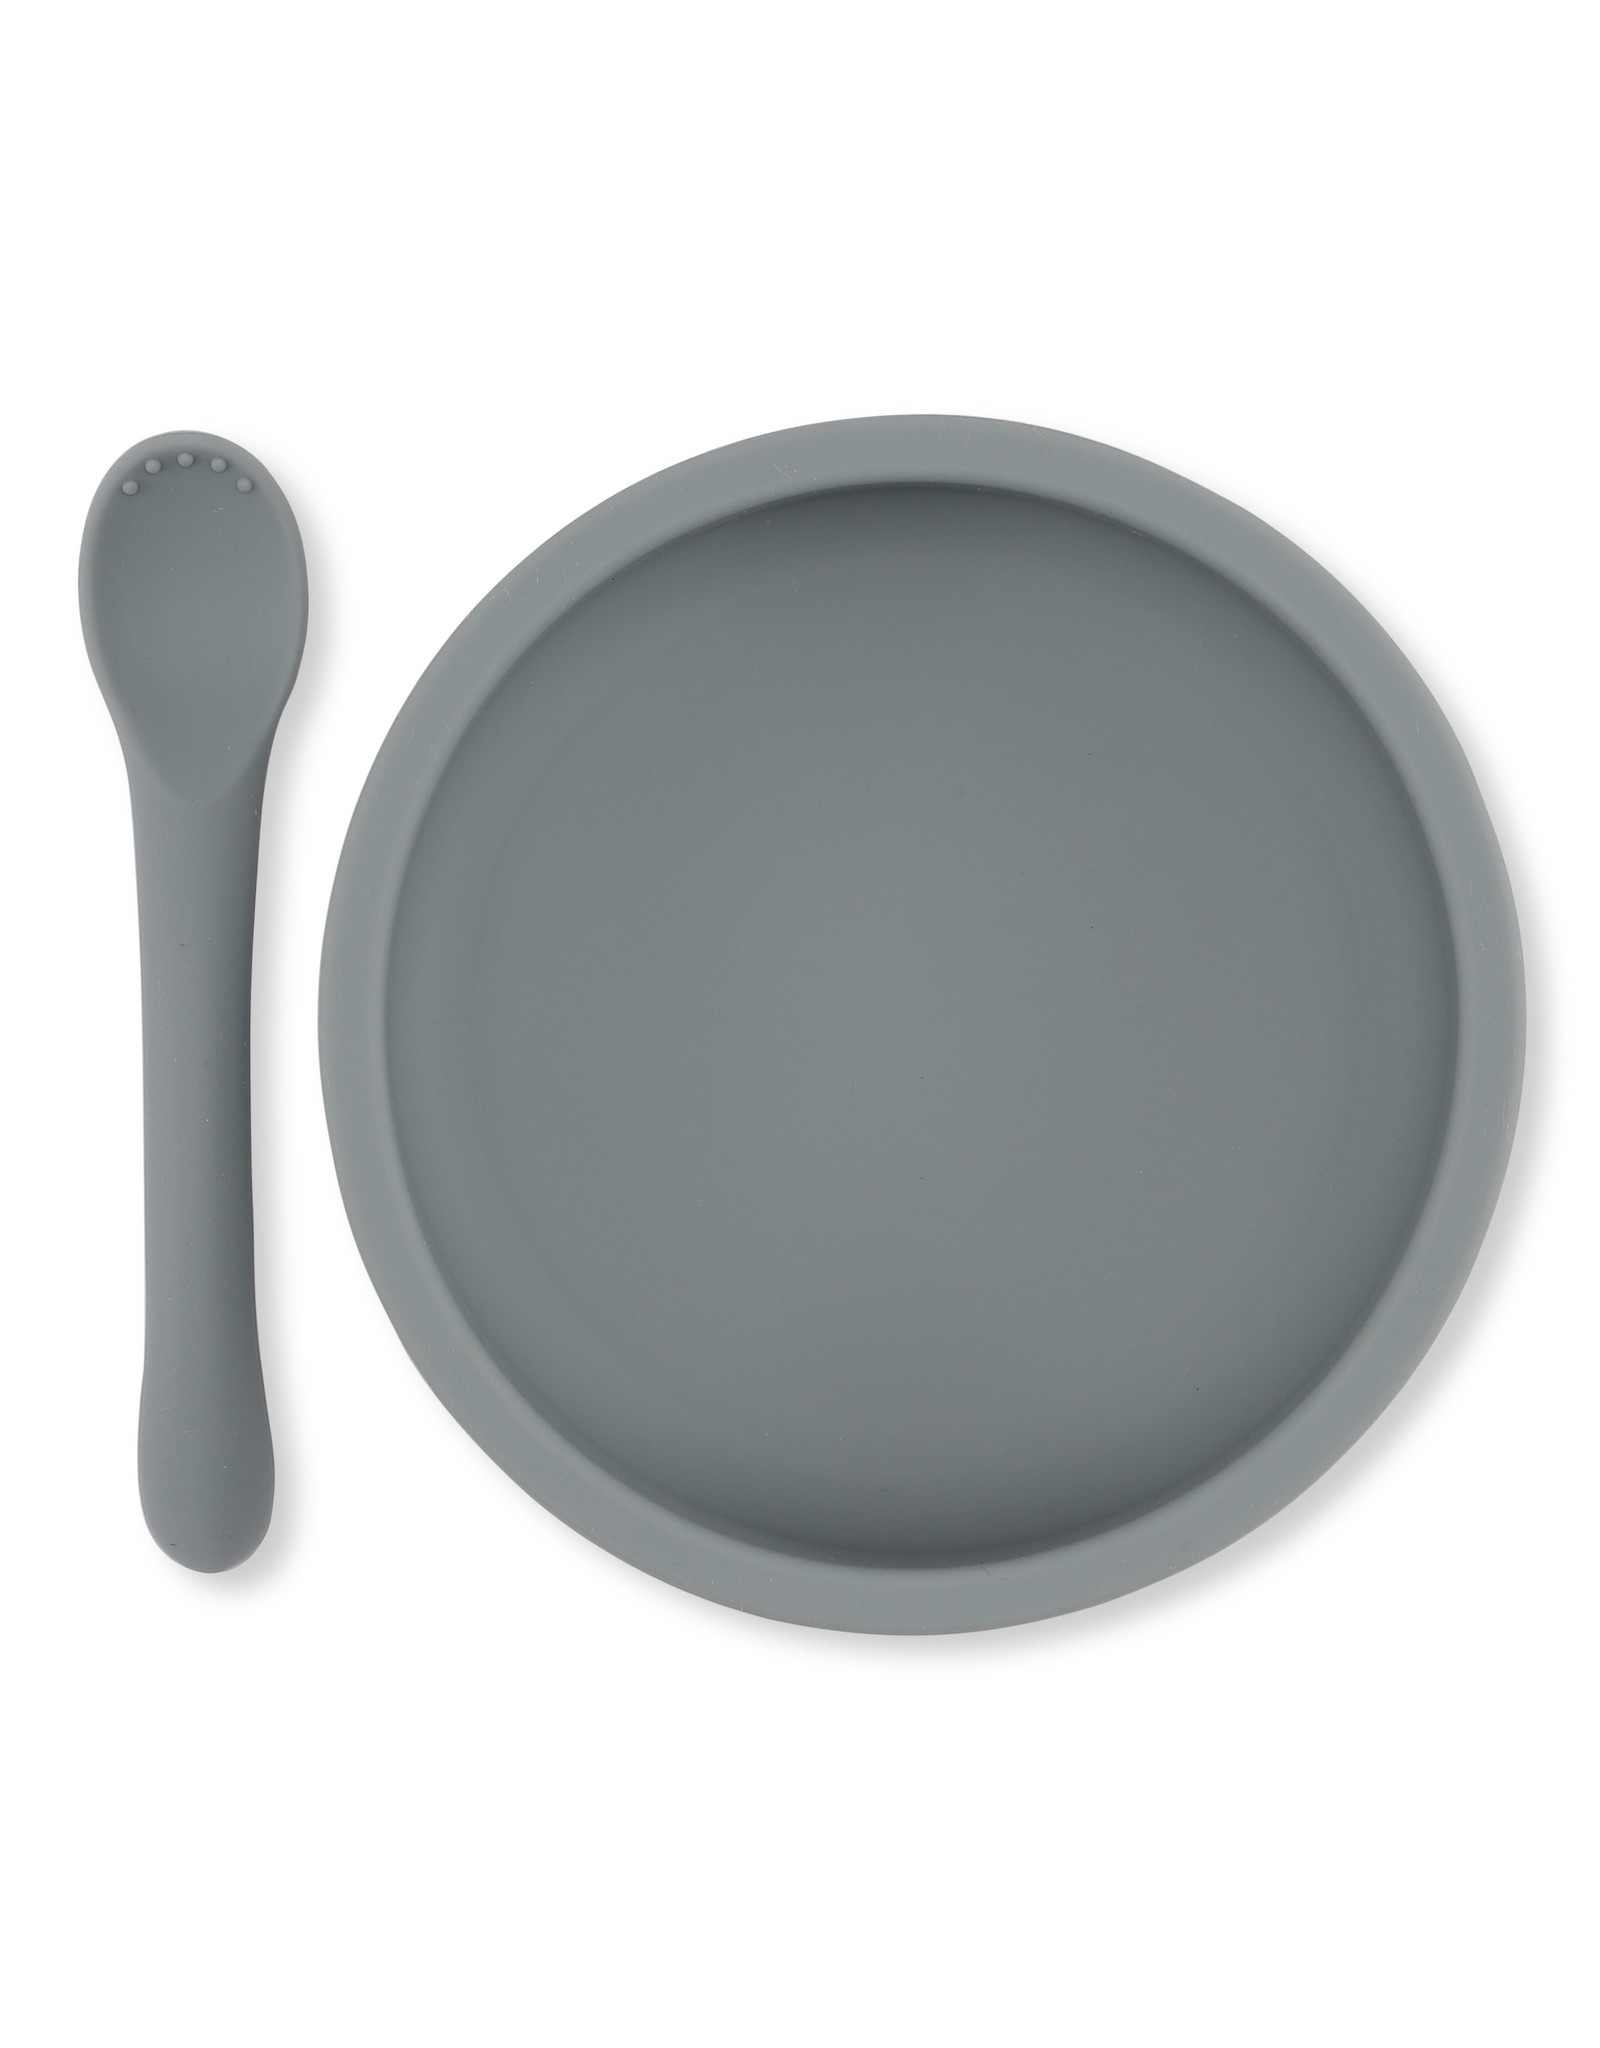 Konges Slojd Konges Slojd bowl & spoon silicone set light blue